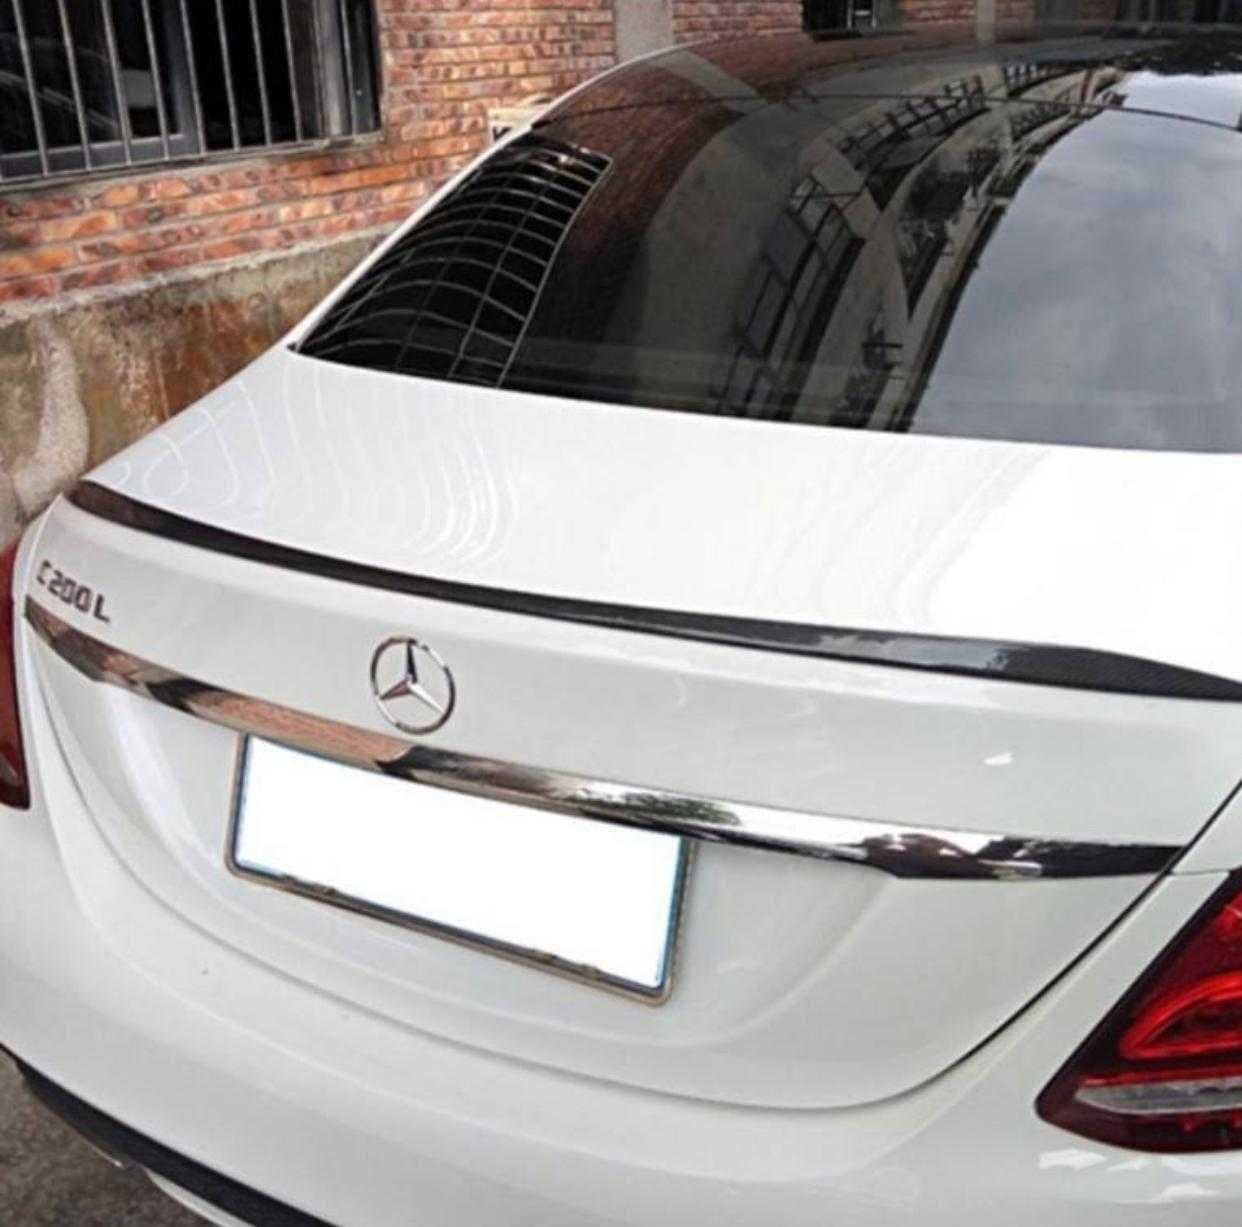 Mercedes W205 C63 Spoiler İnce Model, ABS Plastik Parlak Siyah